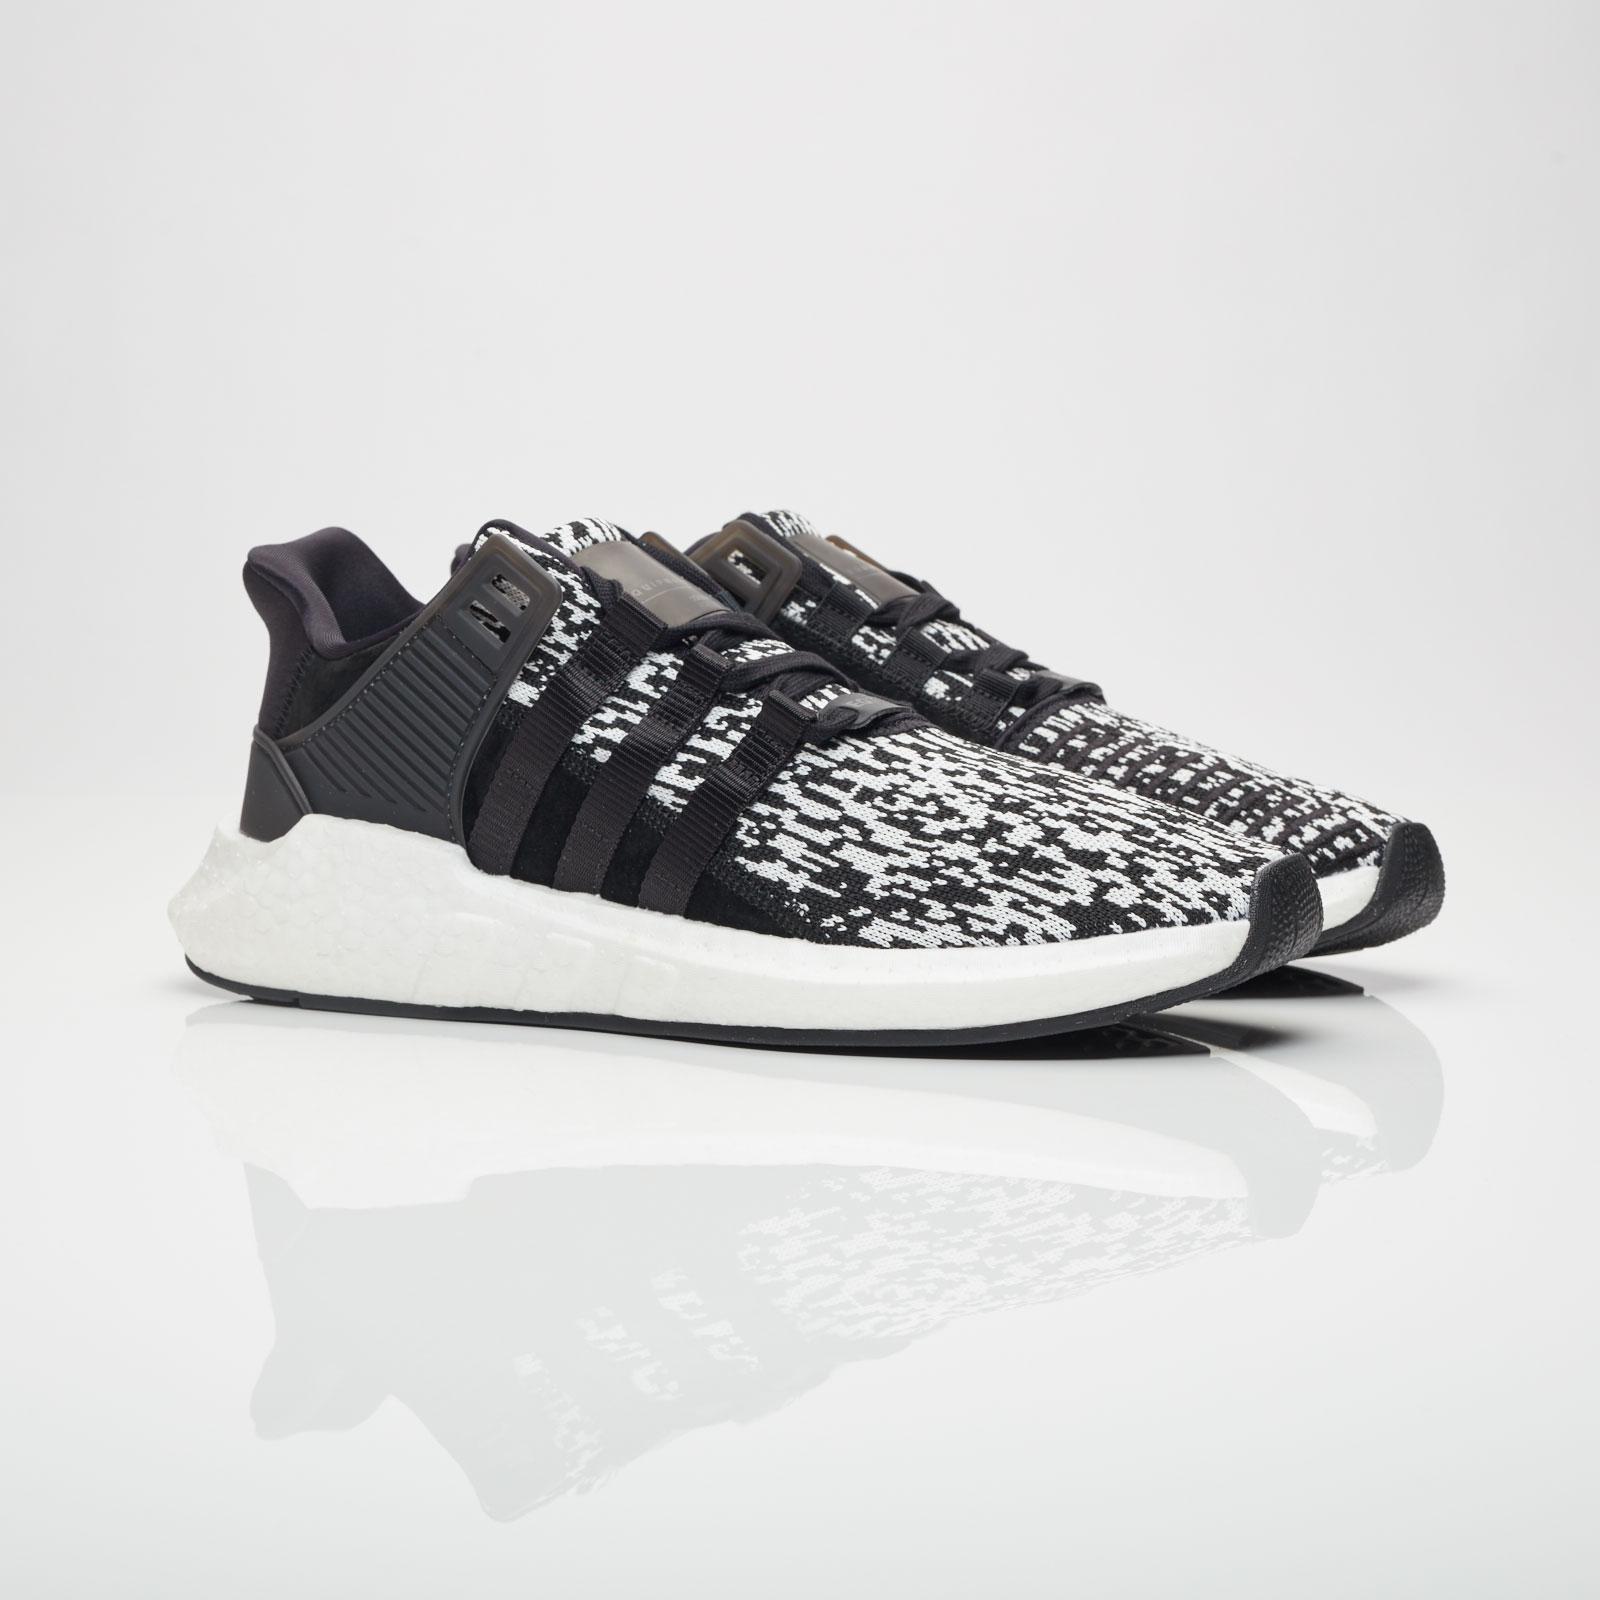 Adidas EQT Support 93 / 17 bz0584 sneakersnstuff Sneakers